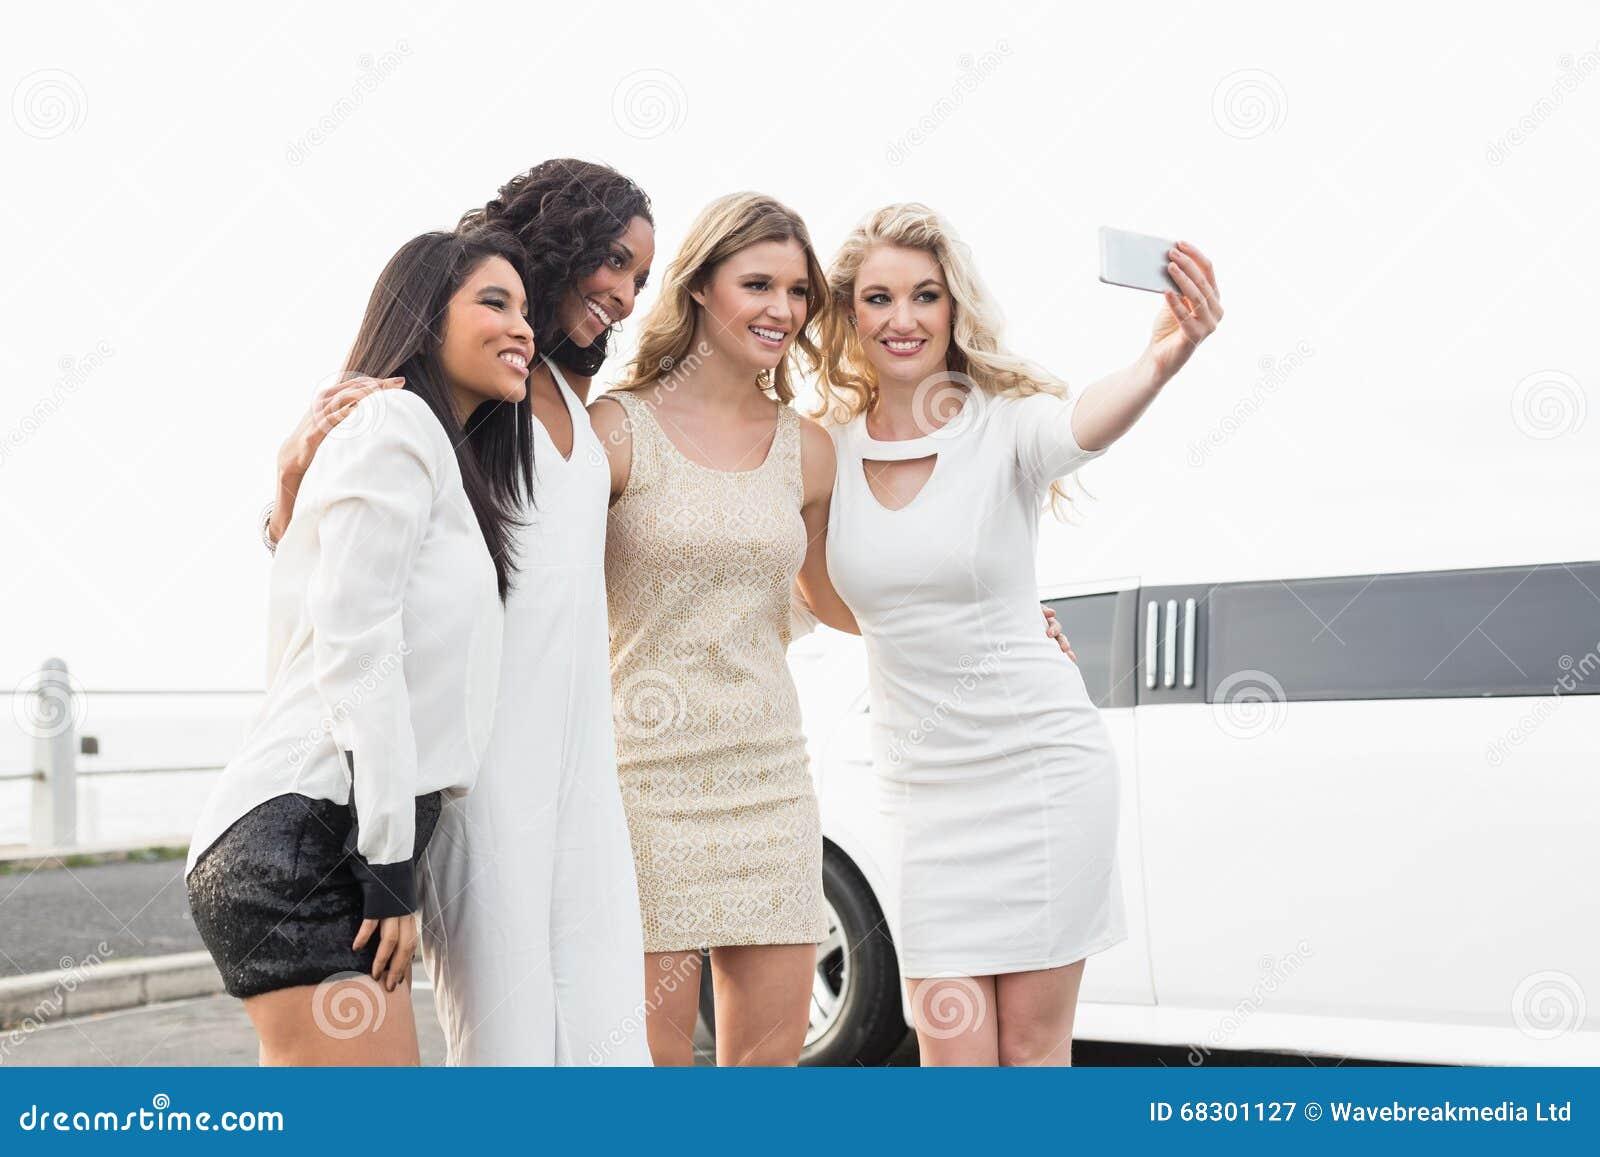 Imagen de mujeres bien vestidas